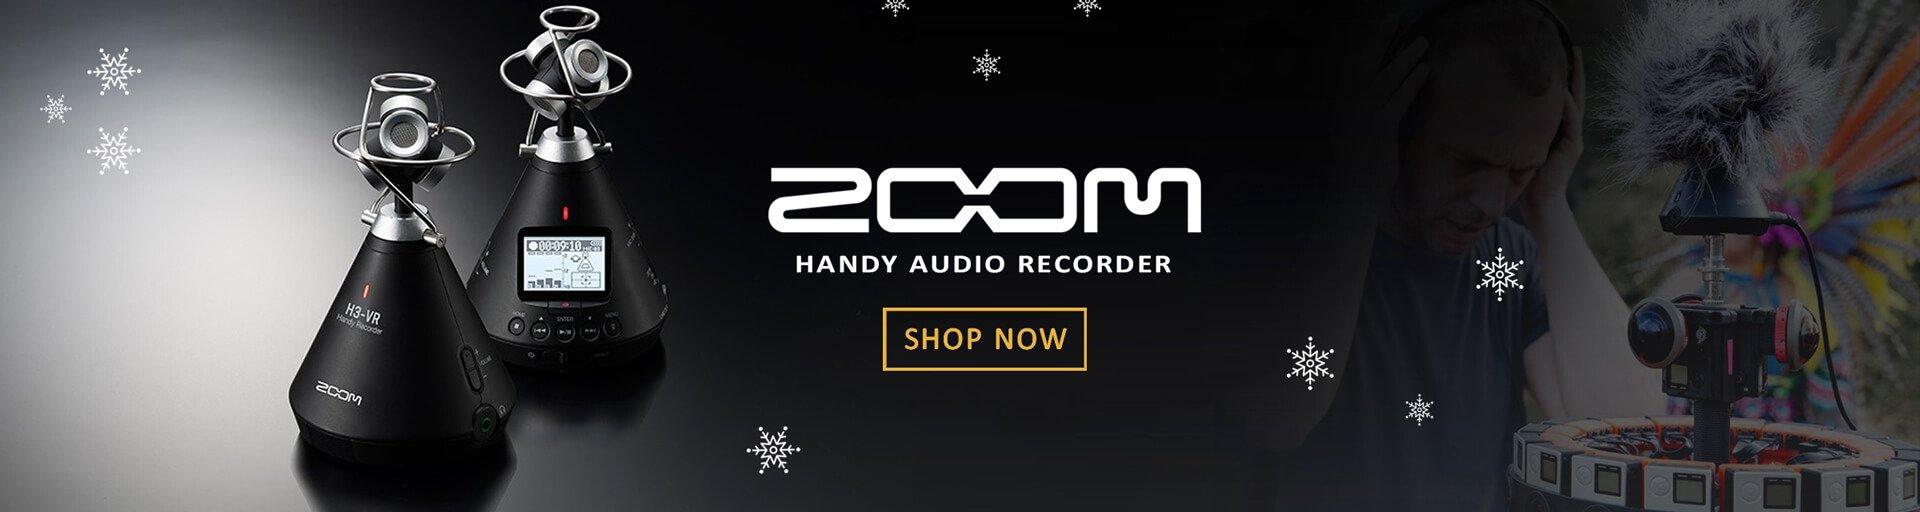 Zoom H3-VR Handy Audio Recorder